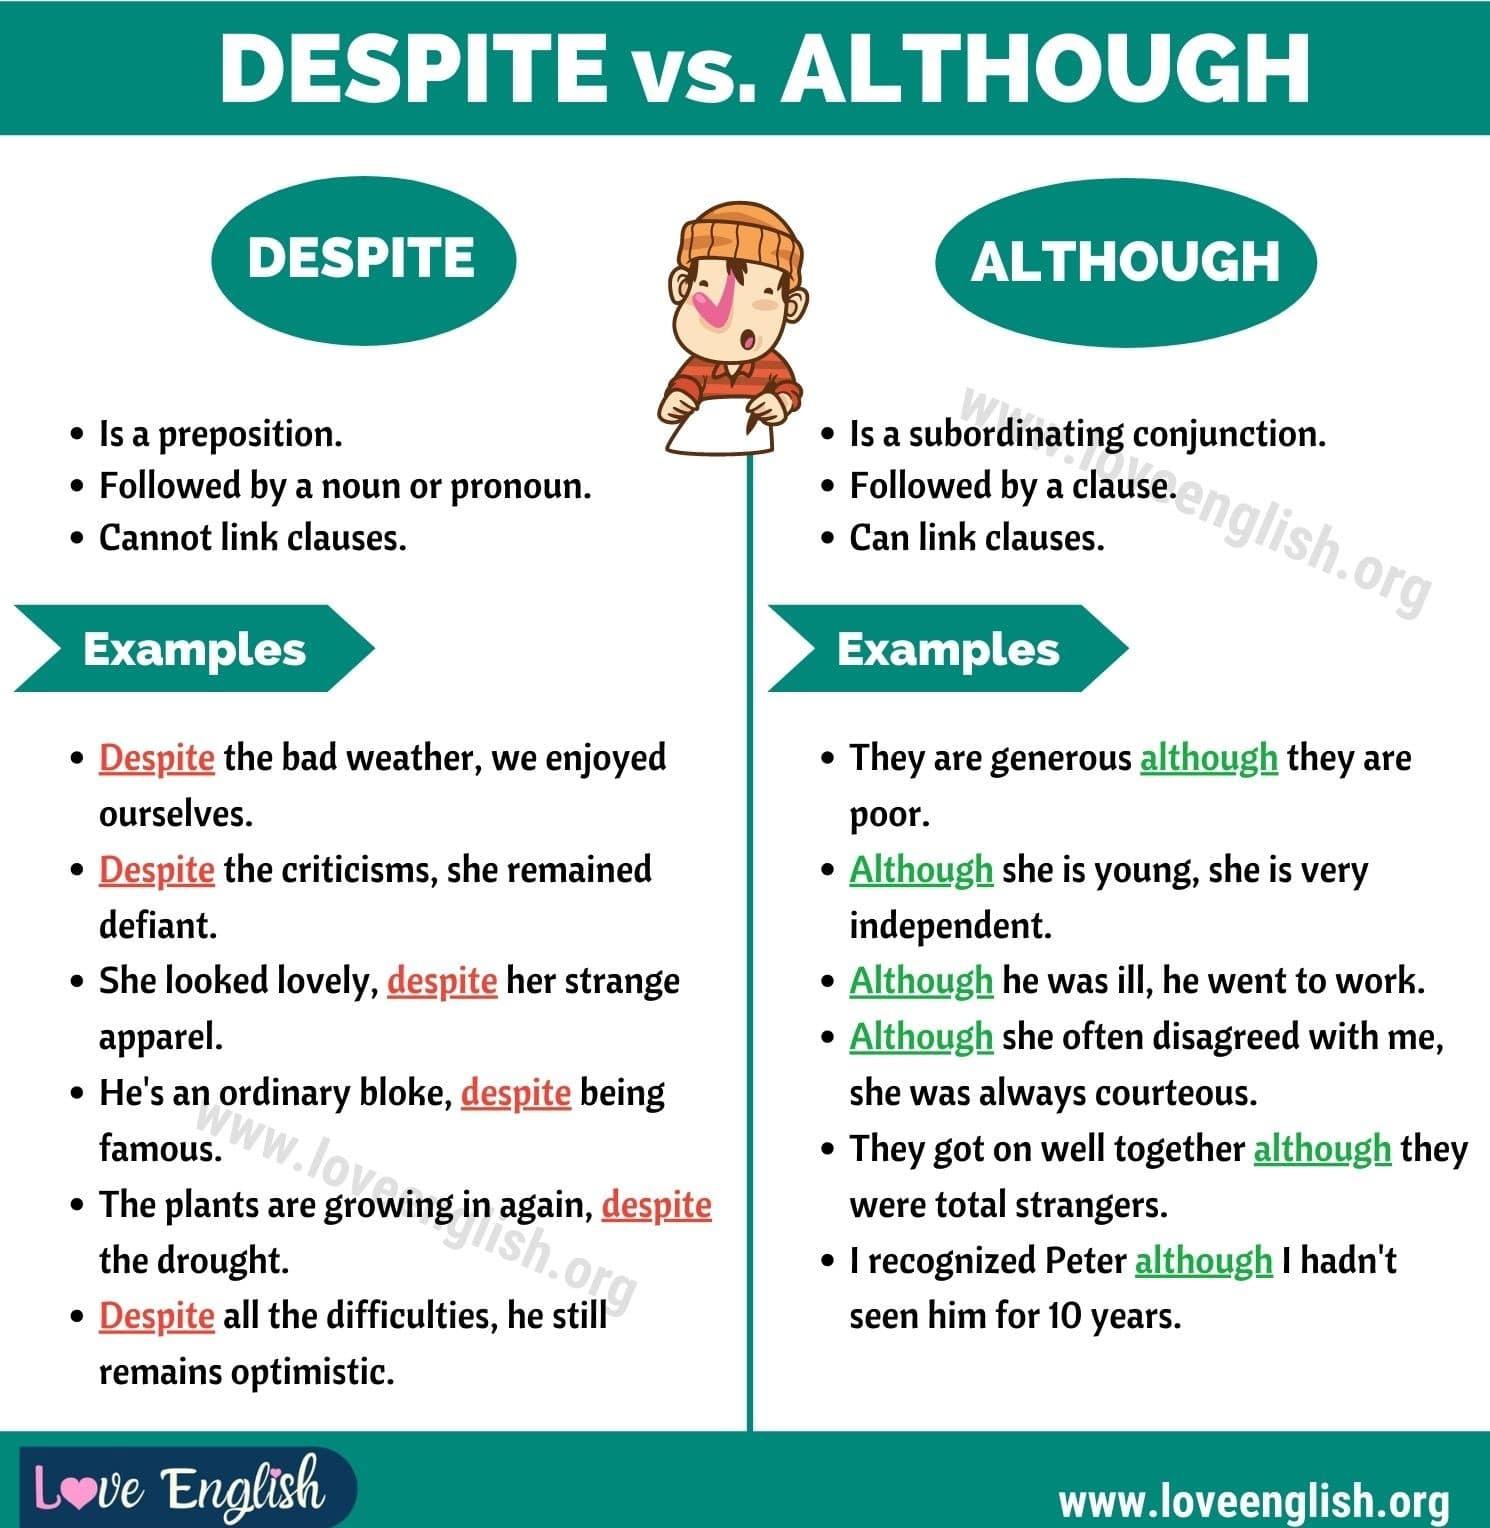 DESPITE vs ALTHOUGH